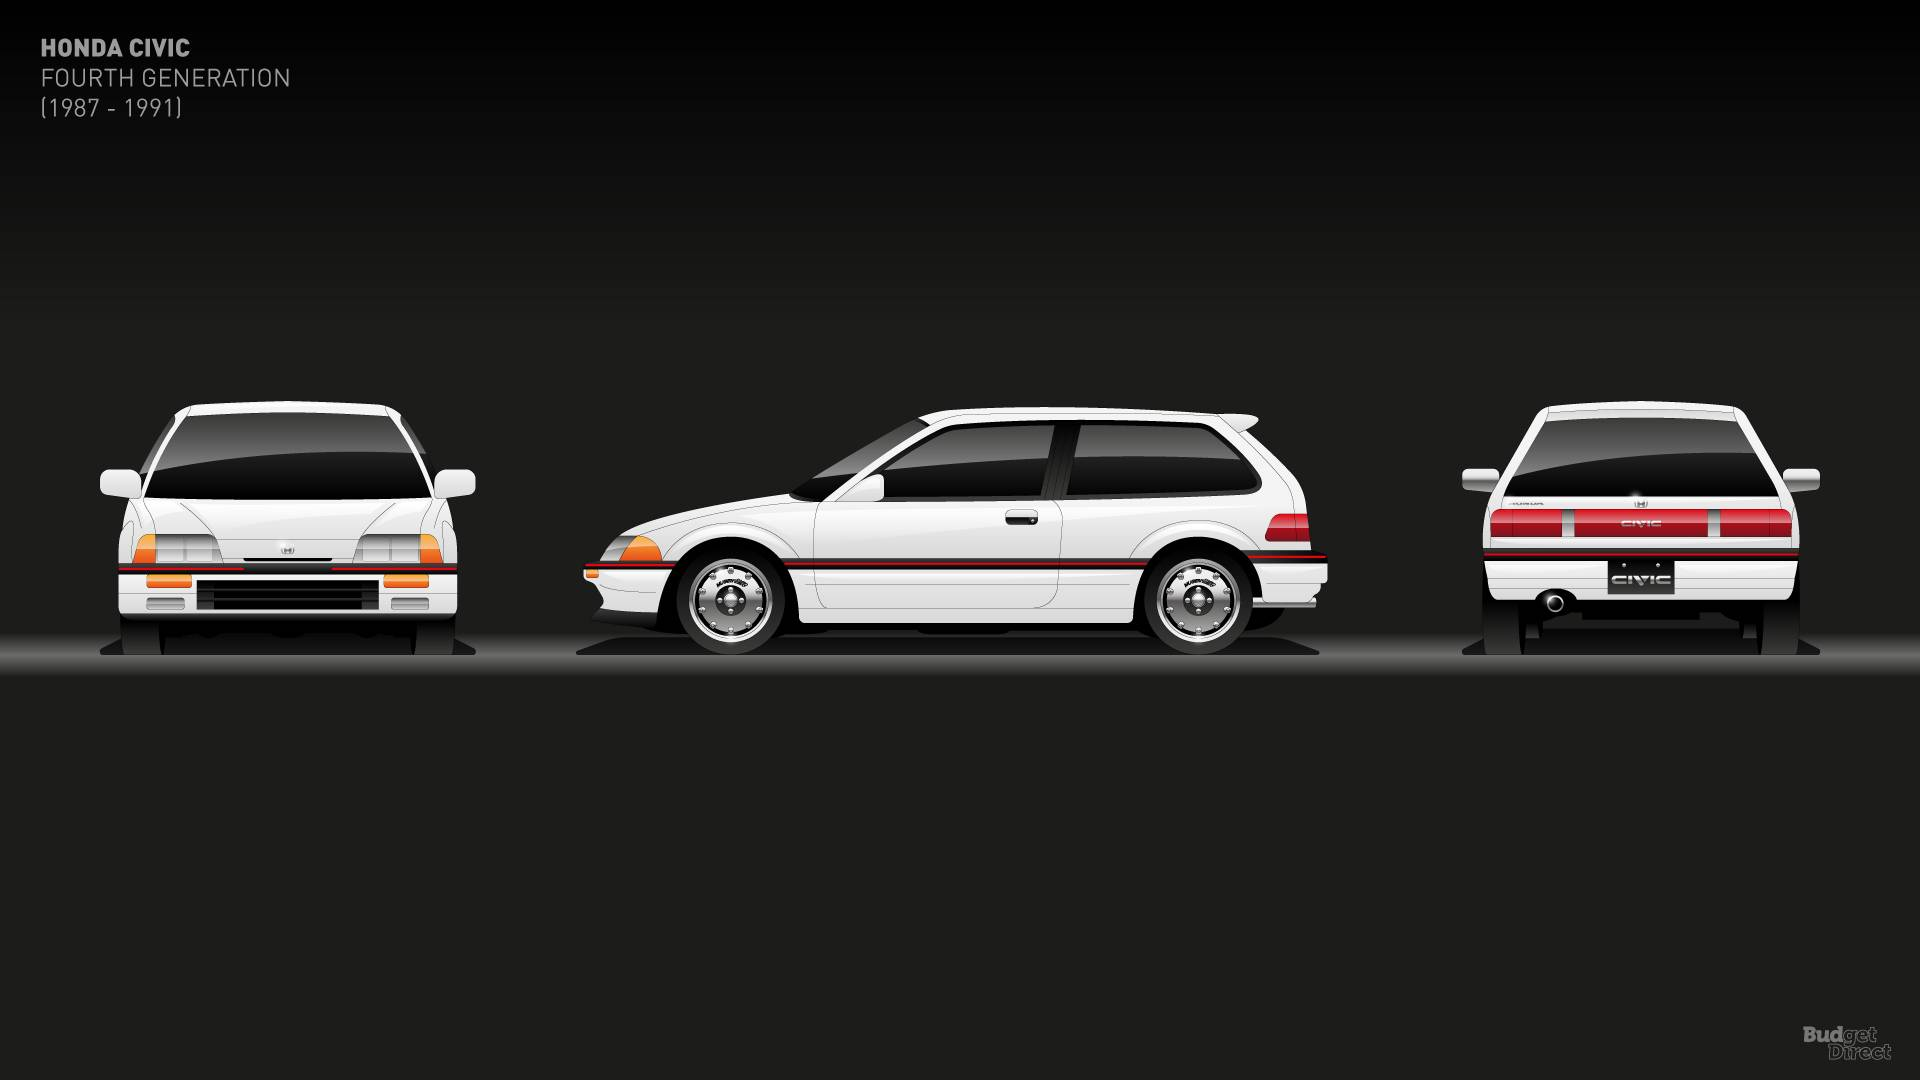 Honda Civic Generations >> 10 Generation Civic Centerfold Is An Awesome Honda History